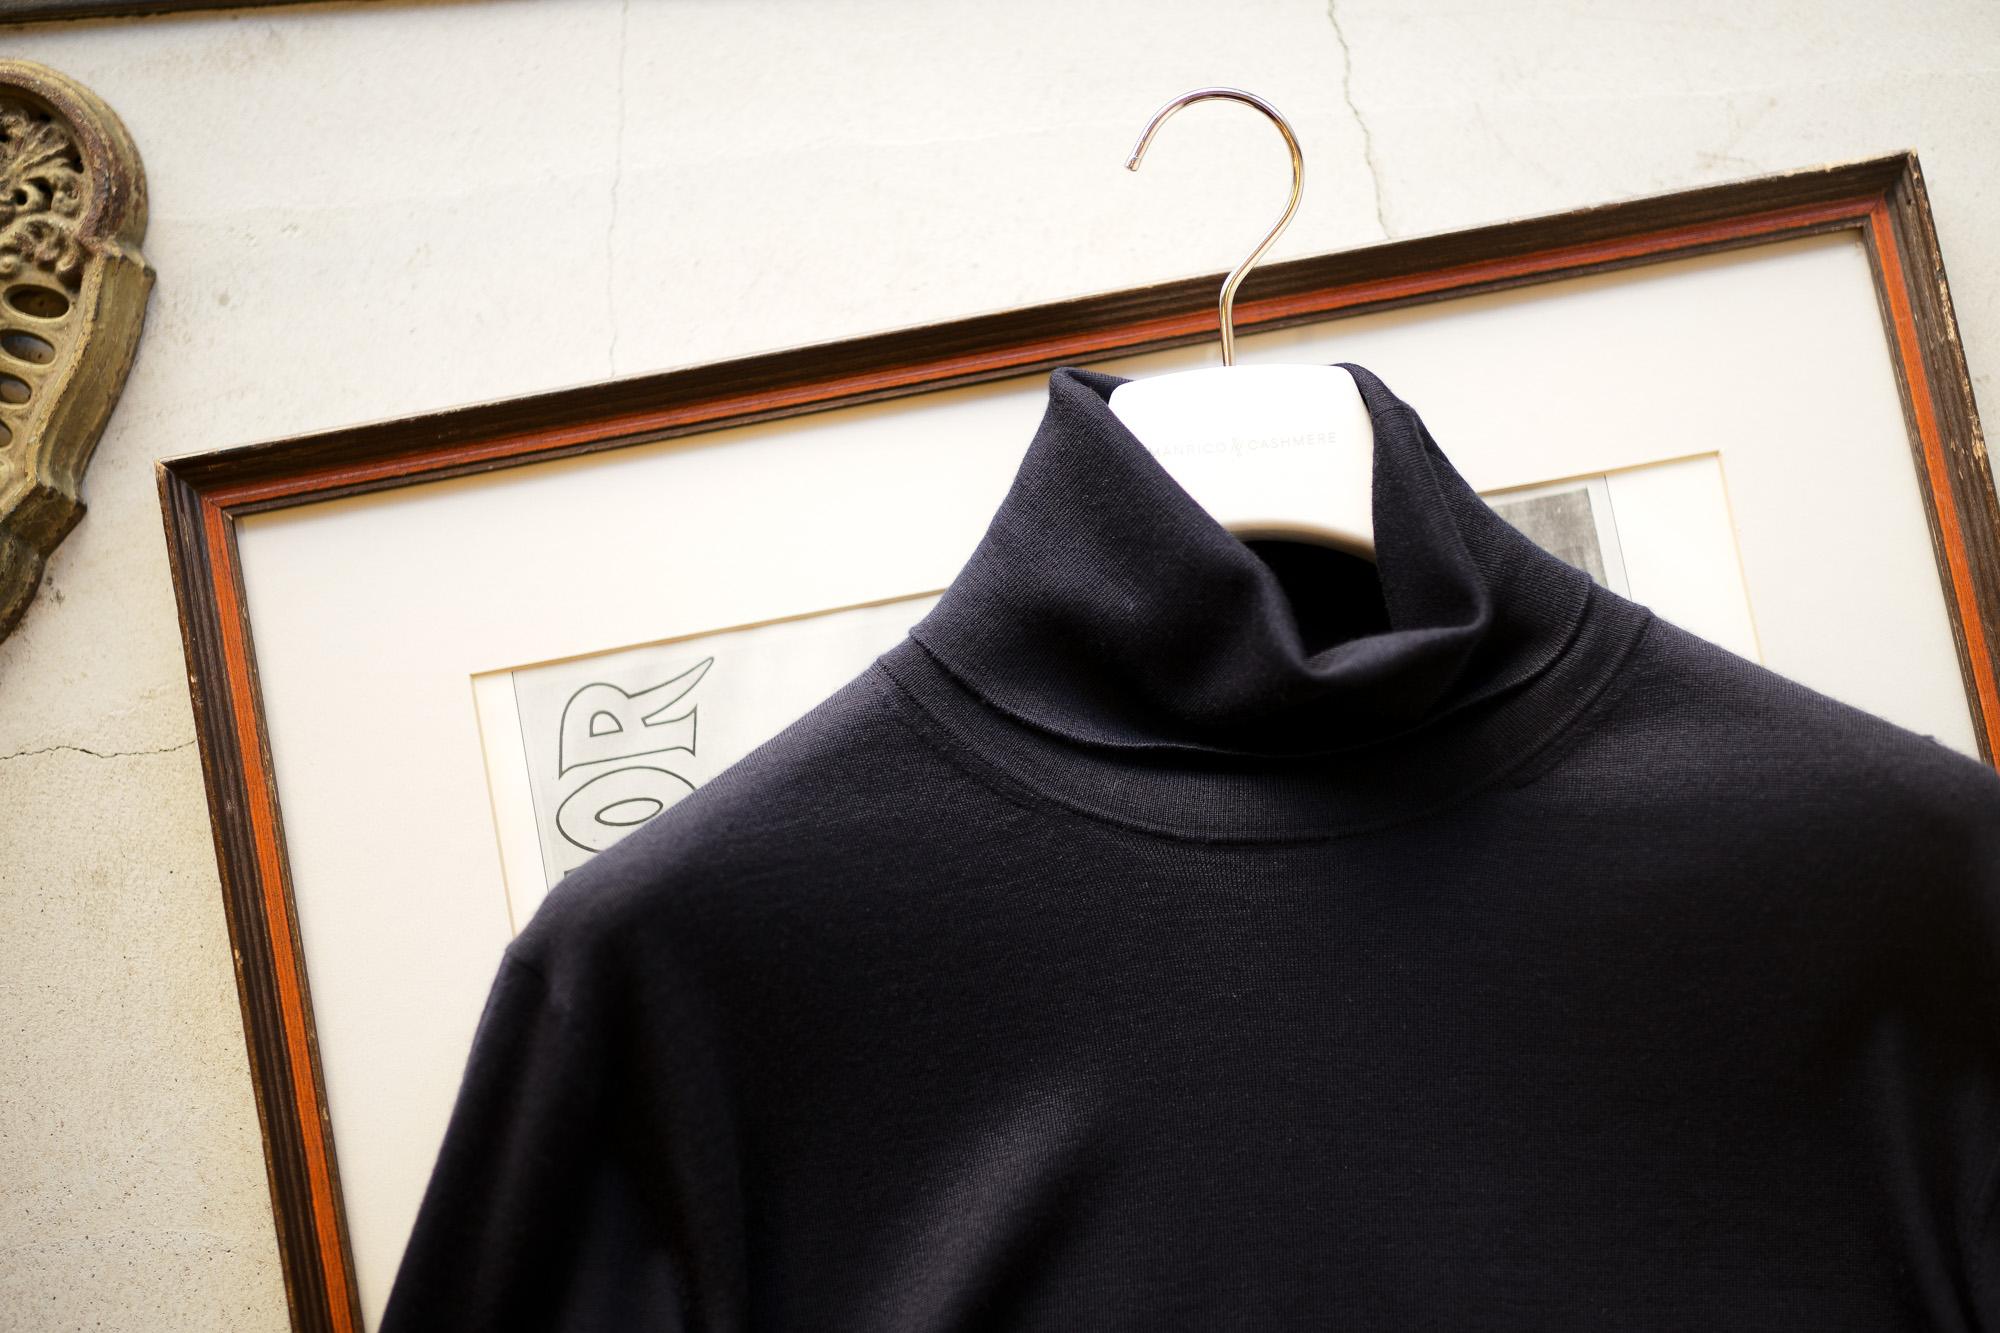 "MANRICO CASHMERE ""Silk Cashmere Wool"" Turtle Neck Sweater M050 0002 2020AW マンリコカシミア カシミヤ シルク カシミヤ ウール ニット イタリア製 altoediritto アルトエデリット 愛知 名古屋"